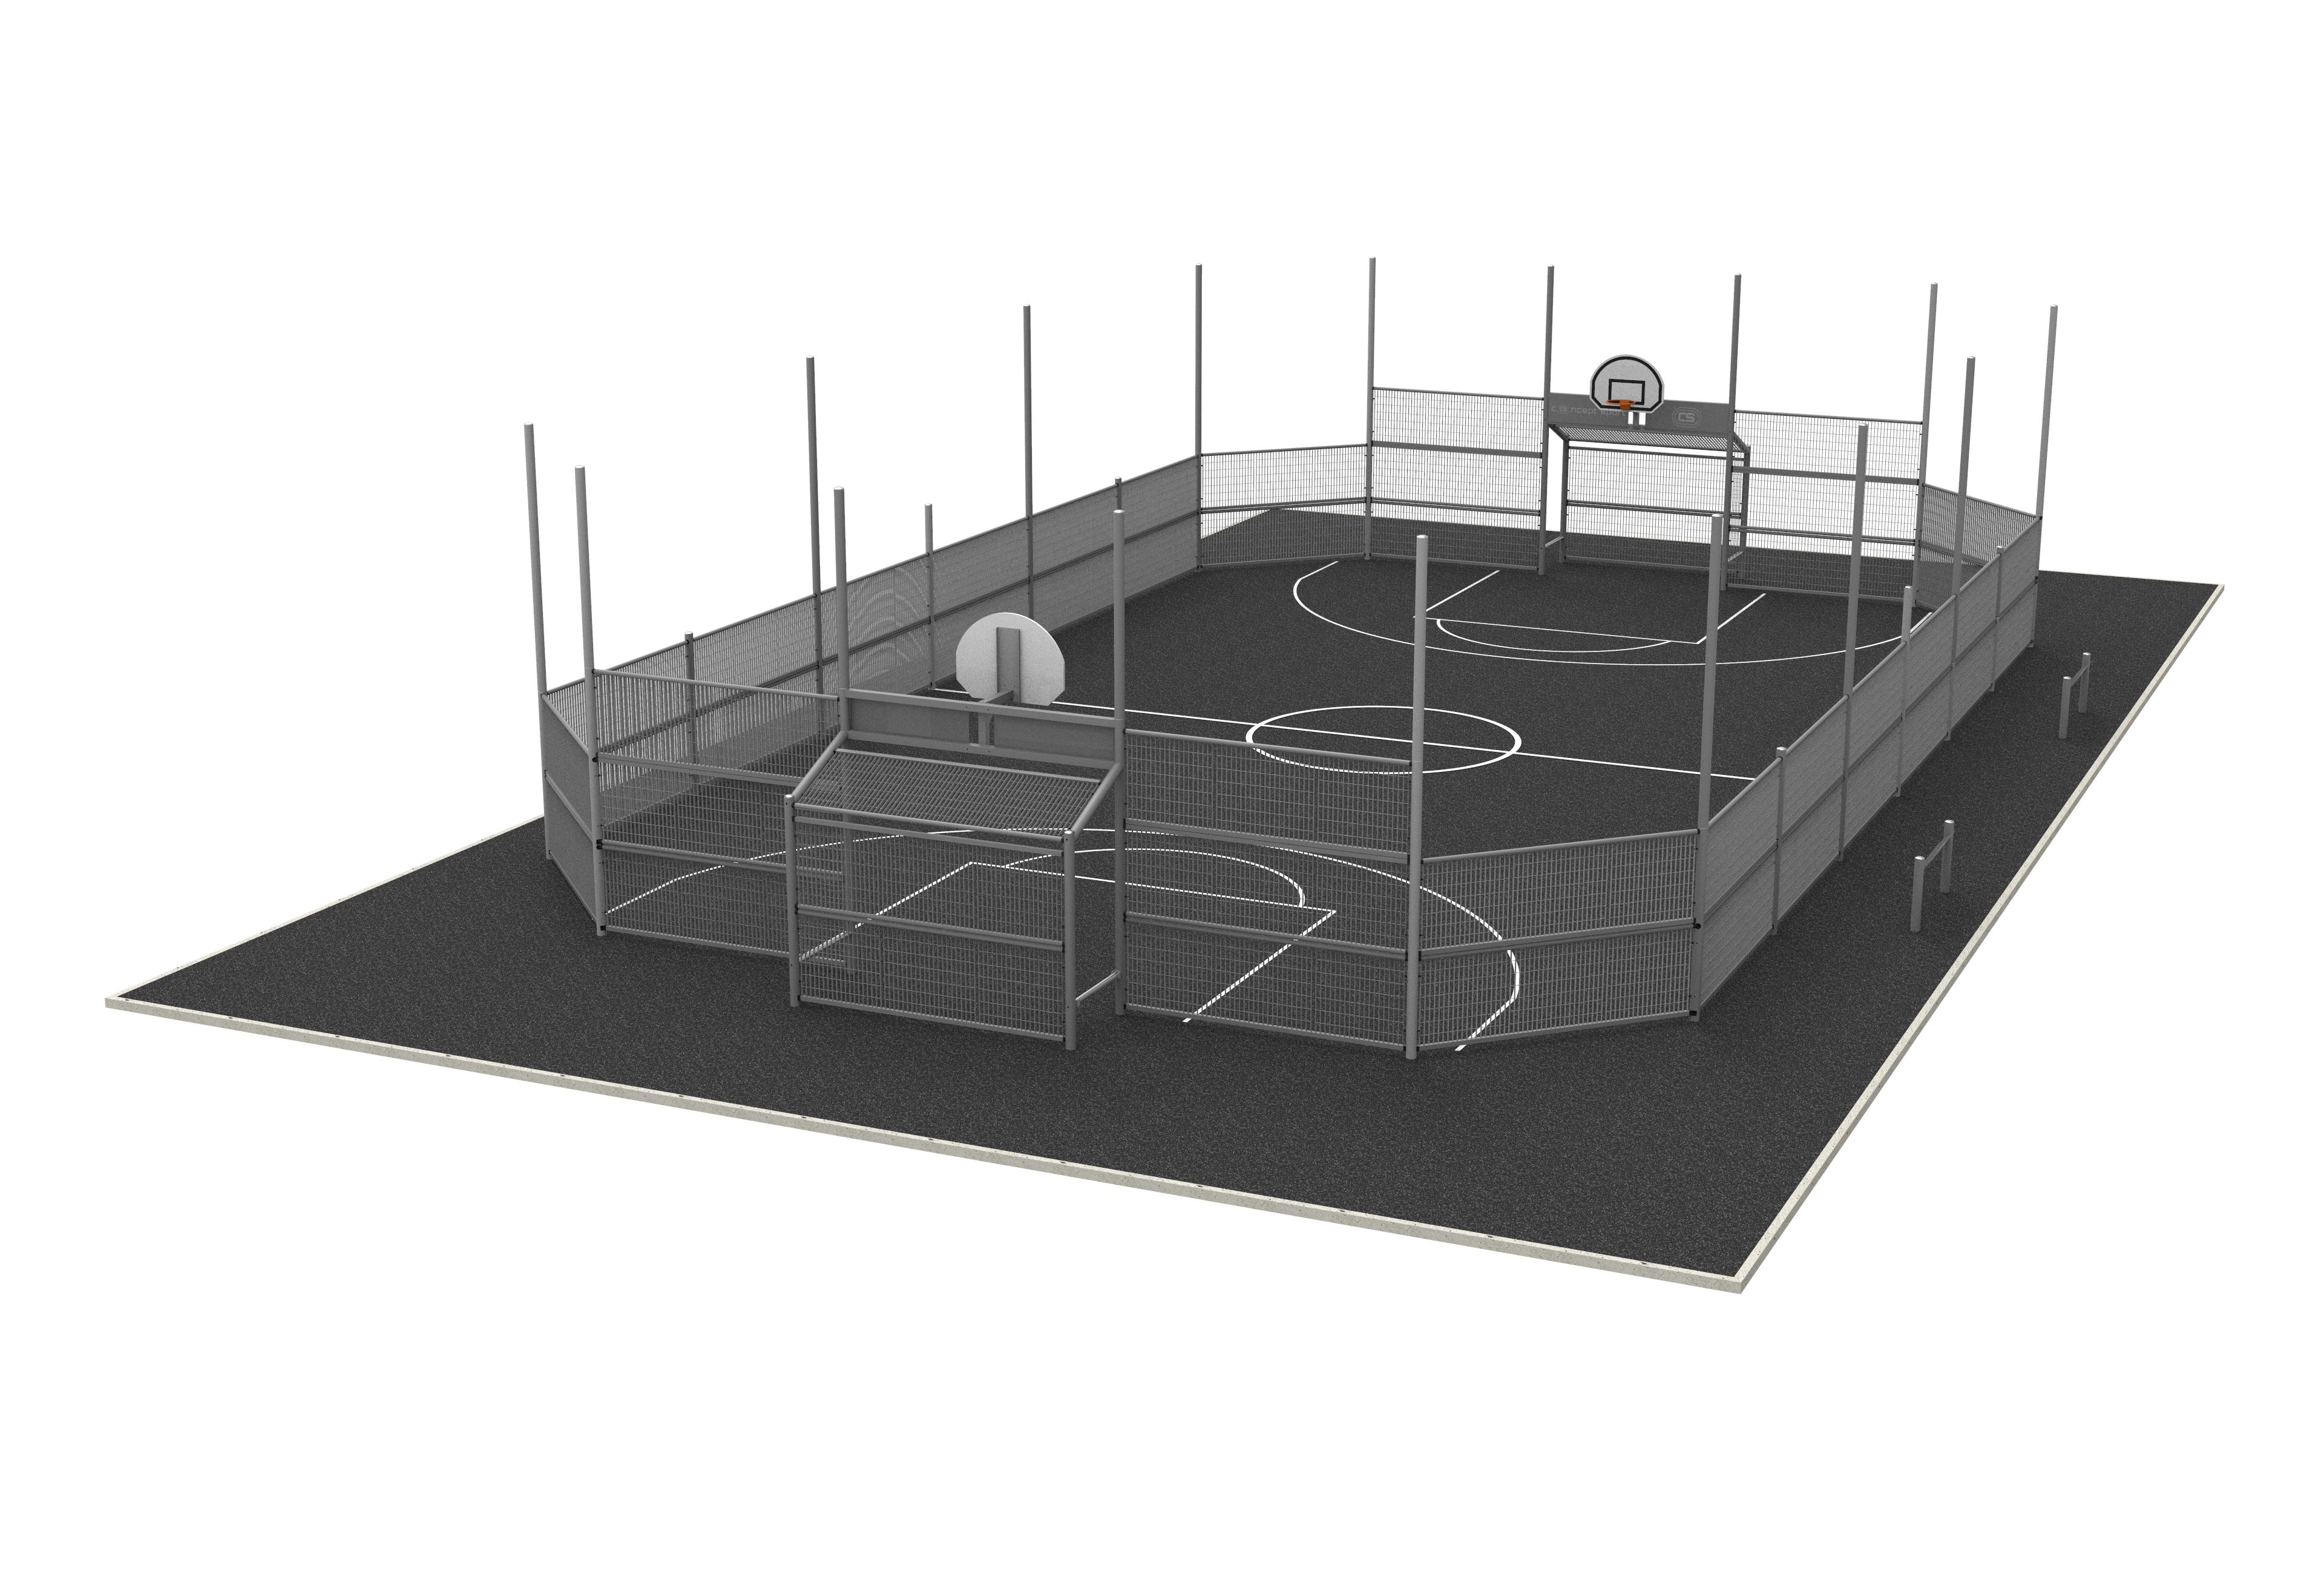 Terrain multisports standard 22.4 m x 13.4 m avec rehausse pare-ballon intégral